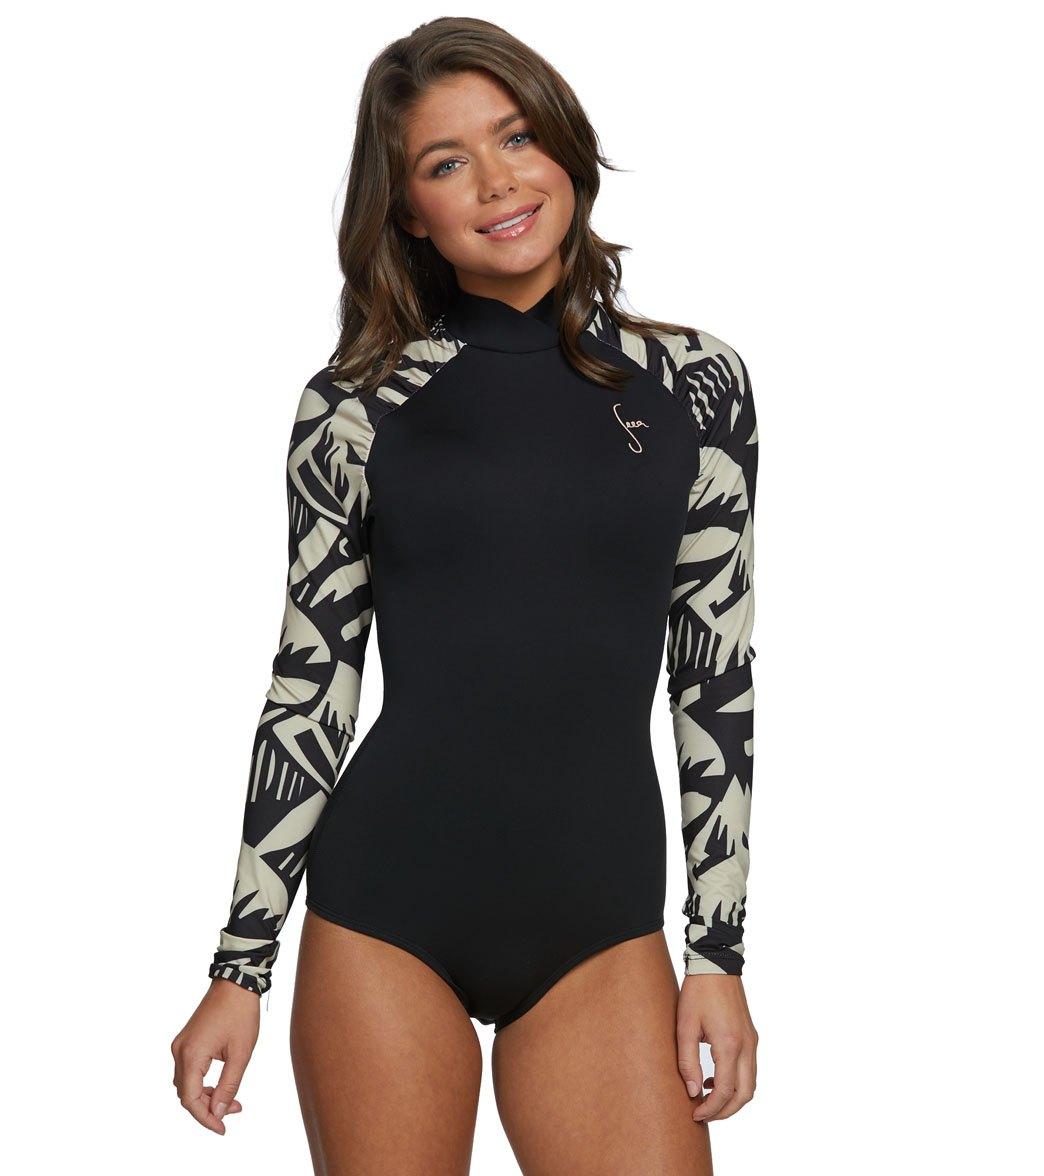 642912822b Seea 0.5mm Neoprene Gaviotas Buzios High Neck Long Sleeve Surf Suit (C Skin)